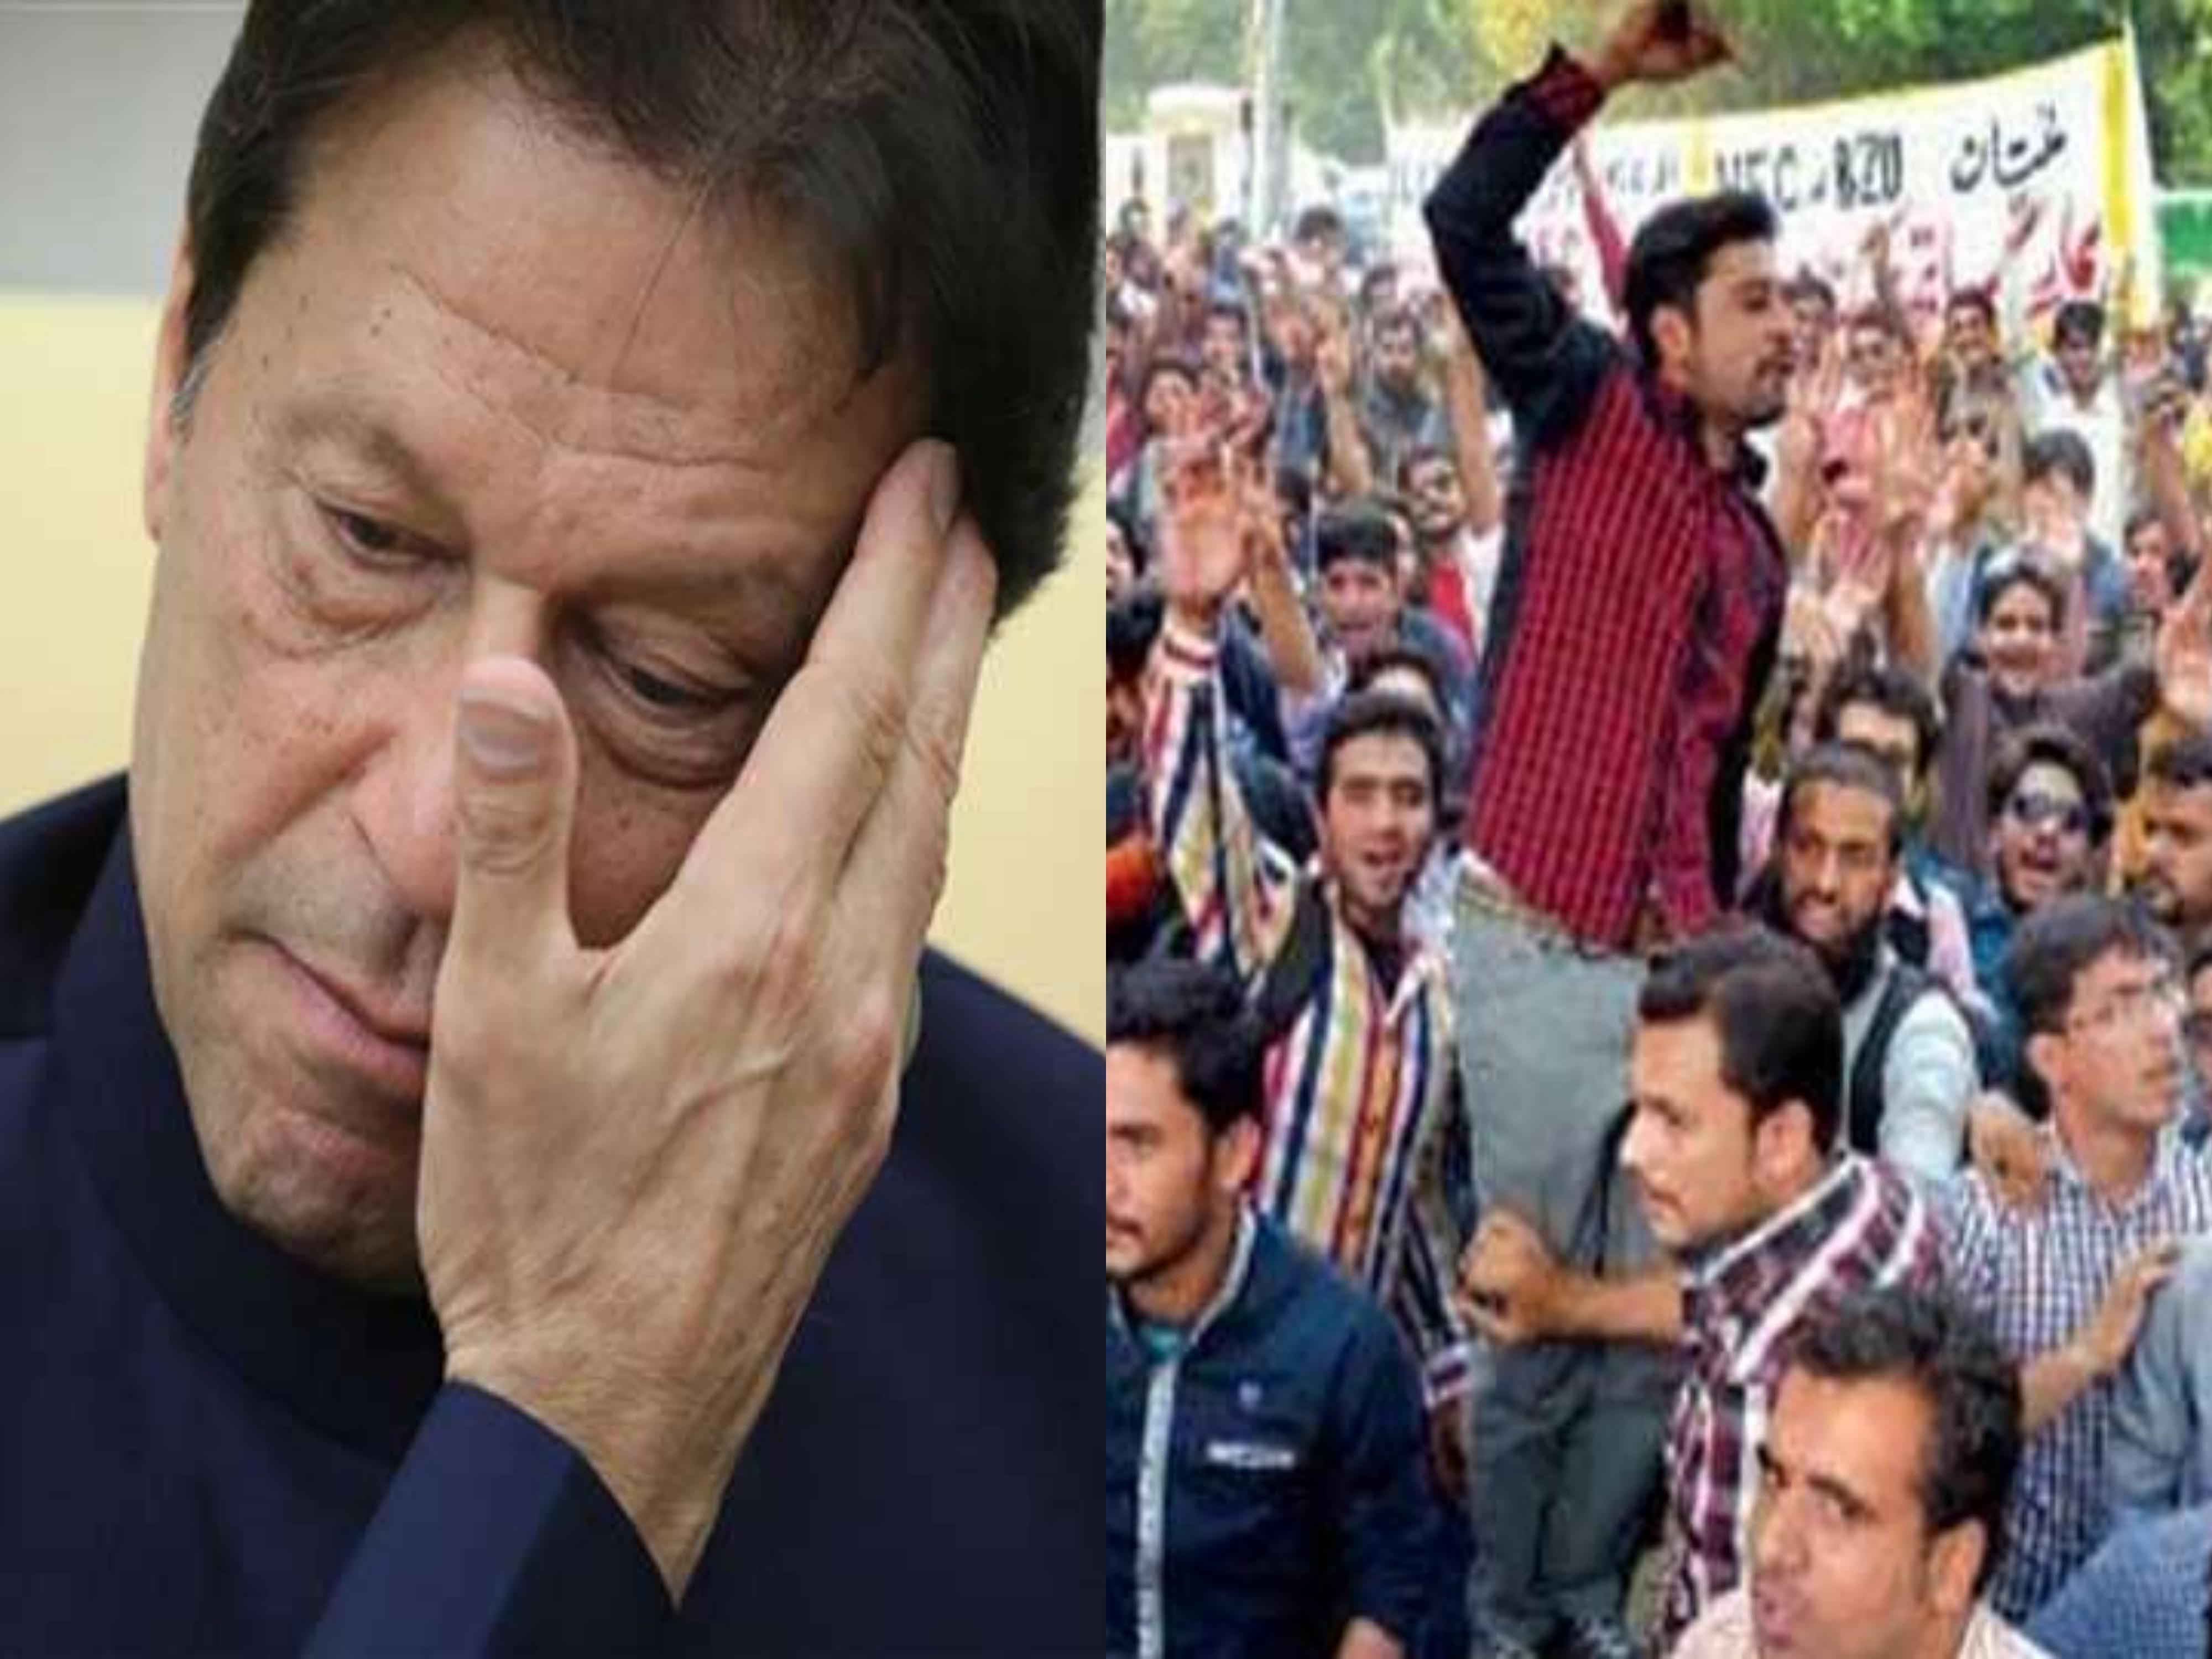 पाकिस्तानमा इमरानविरुद्ध विद्यार्थीकाे संघर्ष, नेतृत्व परिवर्तनकाे तयारी